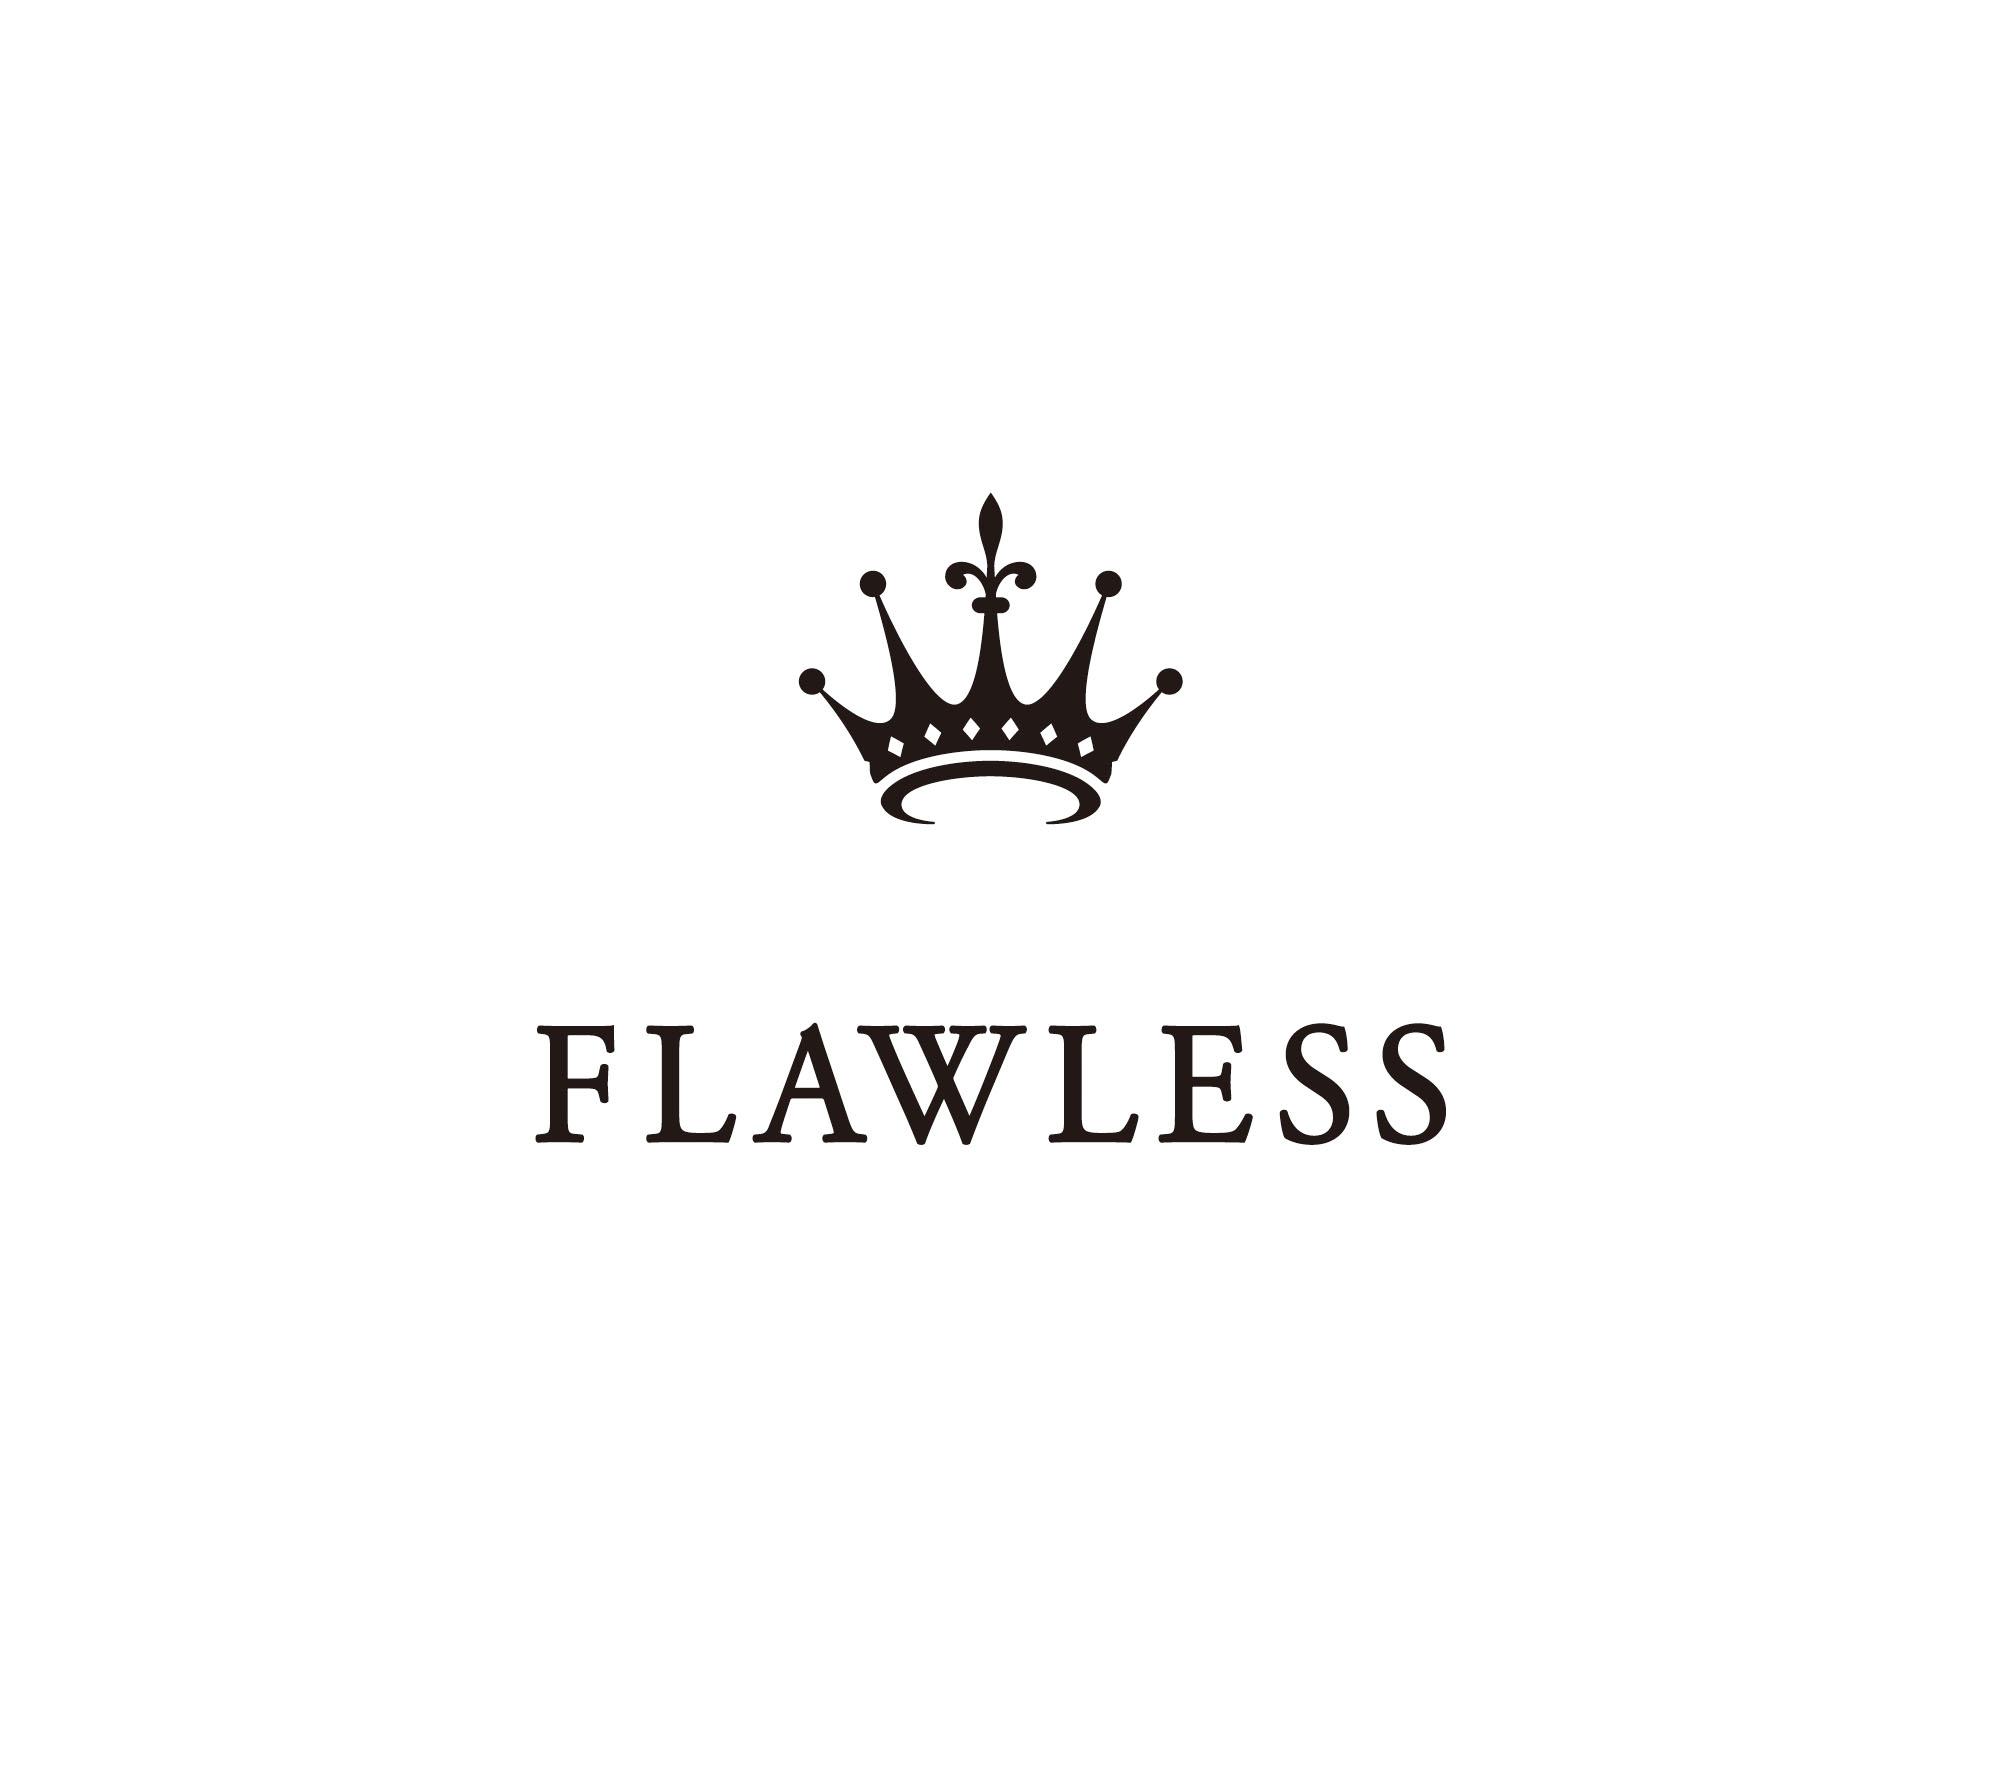 株式会社 FLAWLESS